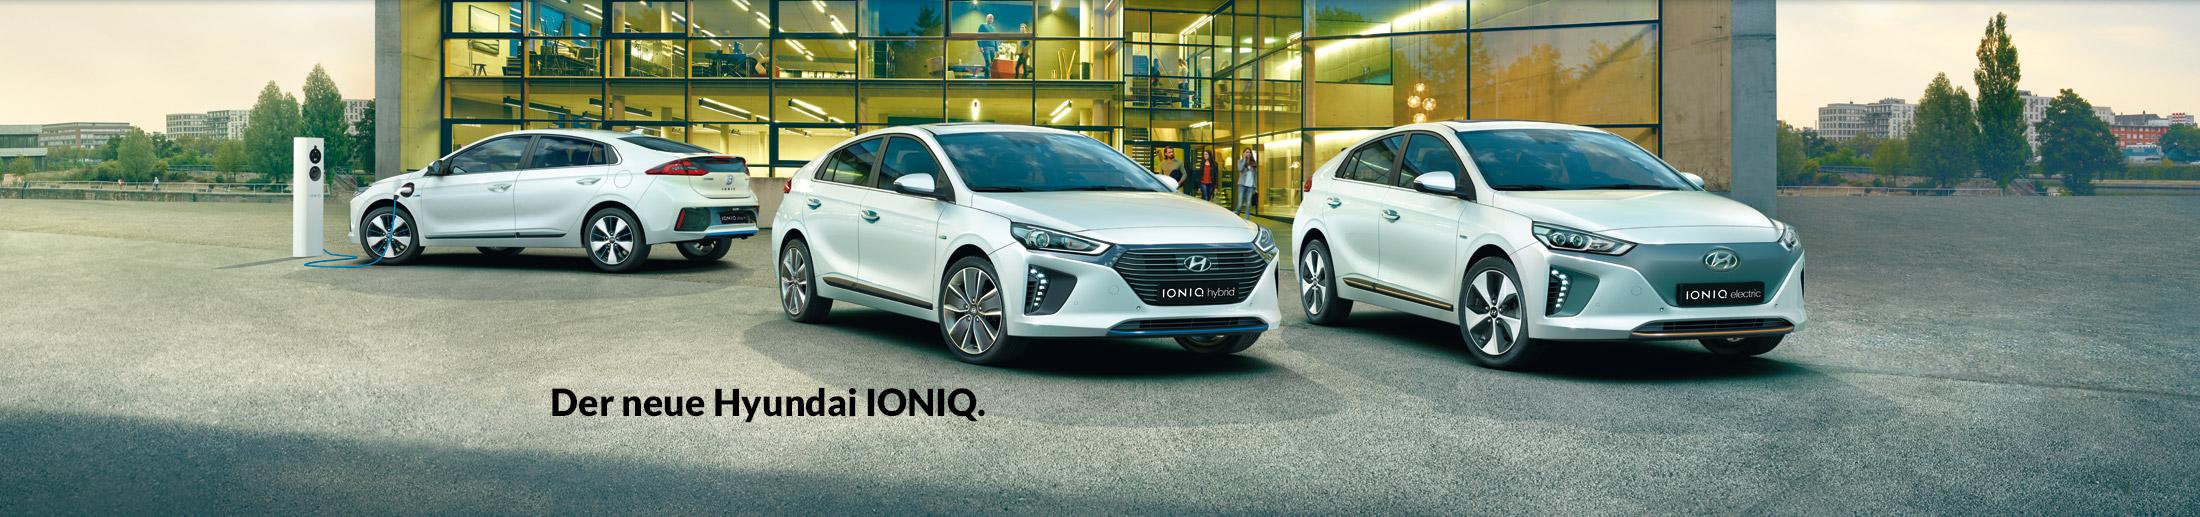 Hyundai-Banner_1